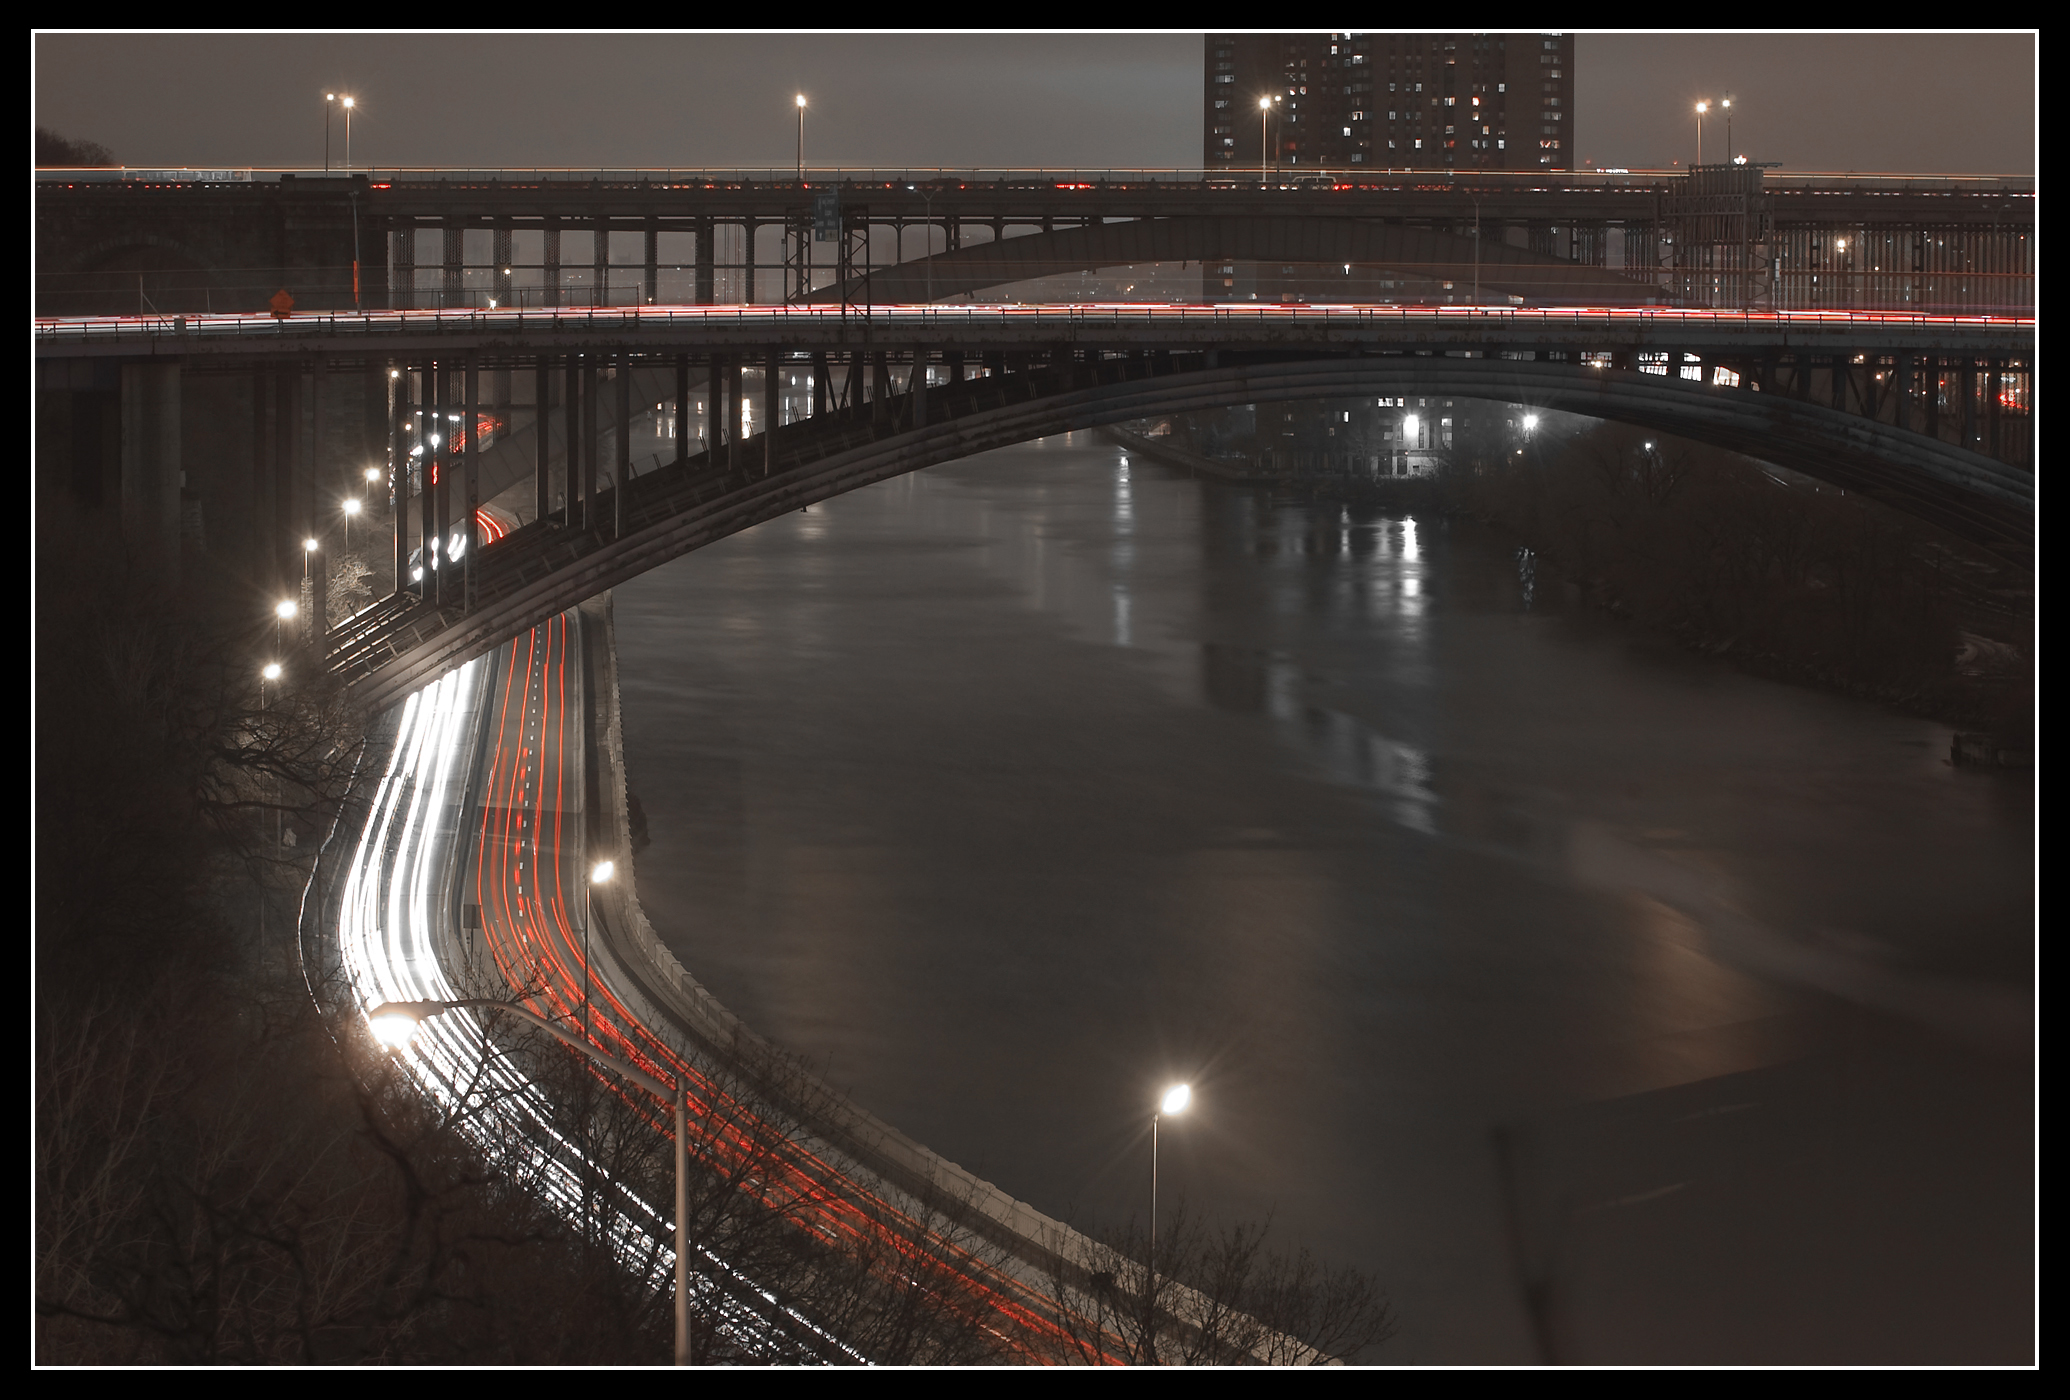 Harlem River, Manhattan/Bronx ... Saturday night, by Timothy Vogel, licence CC